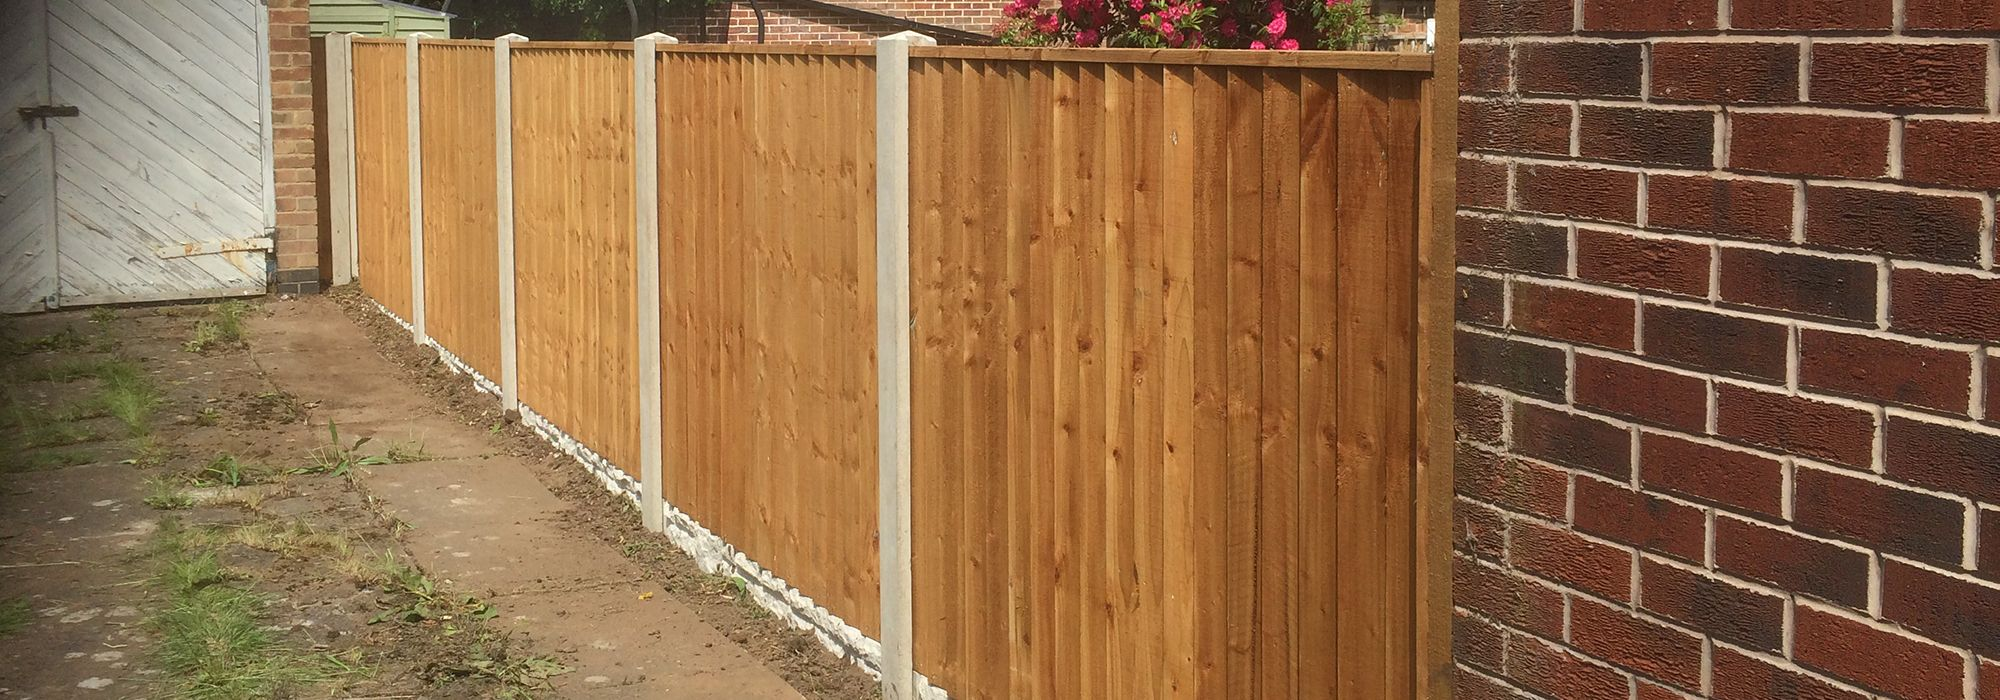 Garden Fencing Nottingham | Joe Taylor Gardening Services